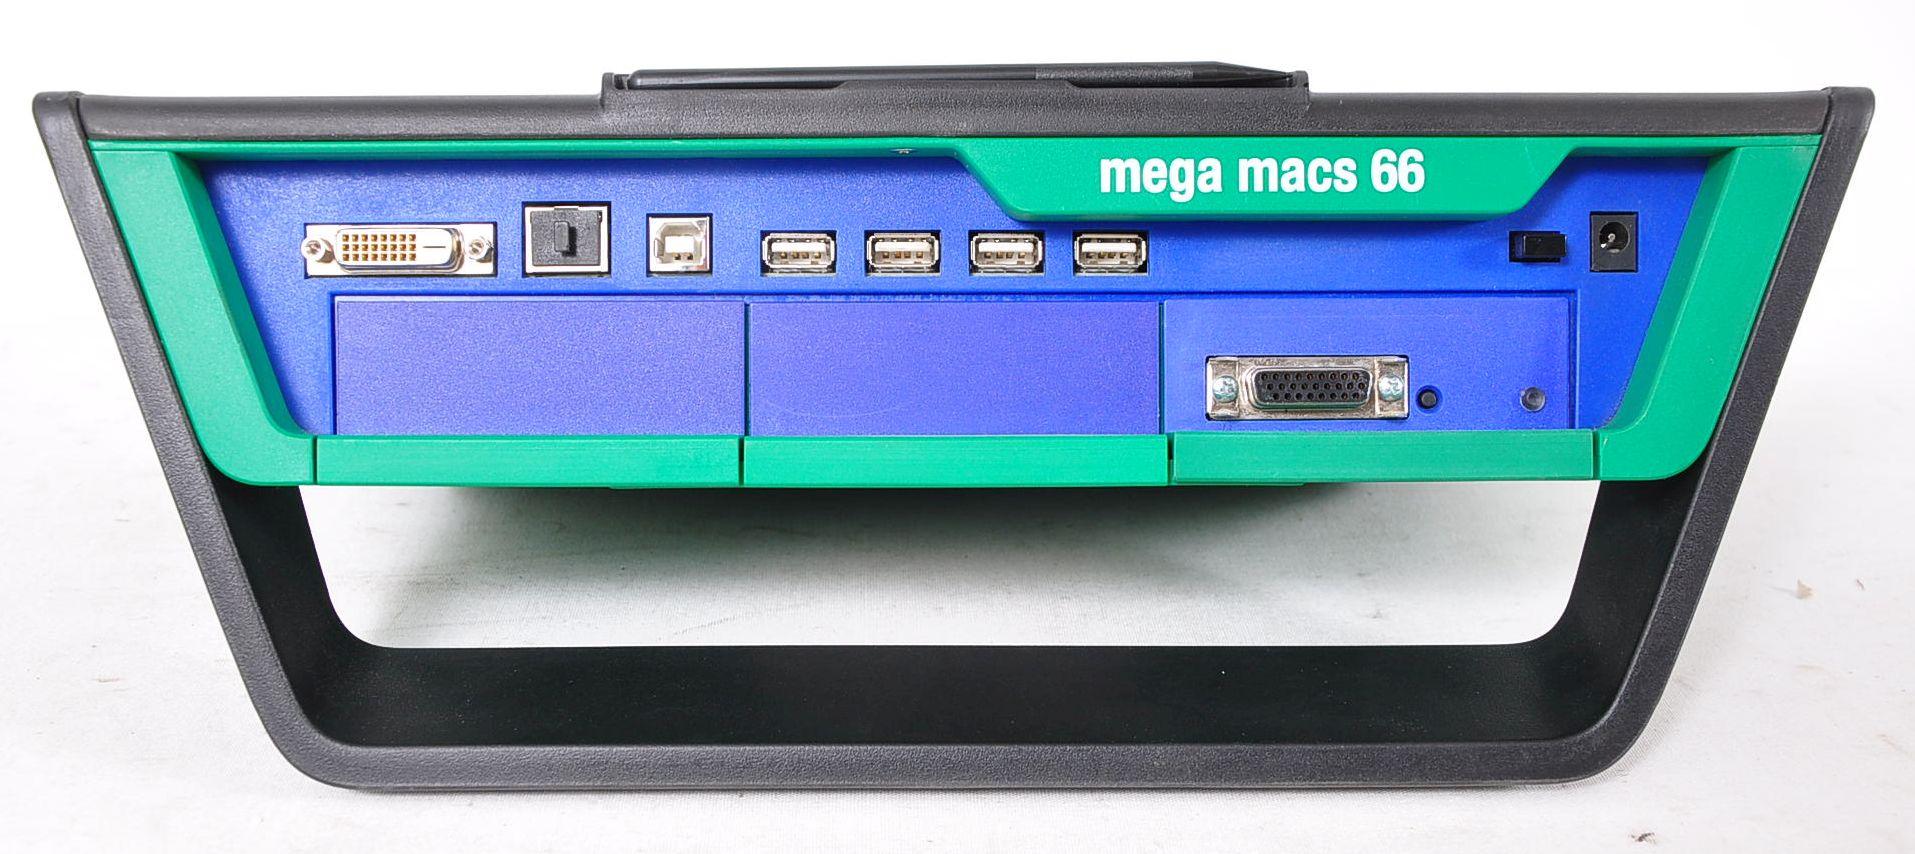 nuovo hella gutmann mega macs mm 66 dispositivo. Black Bedroom Furniture Sets. Home Design Ideas